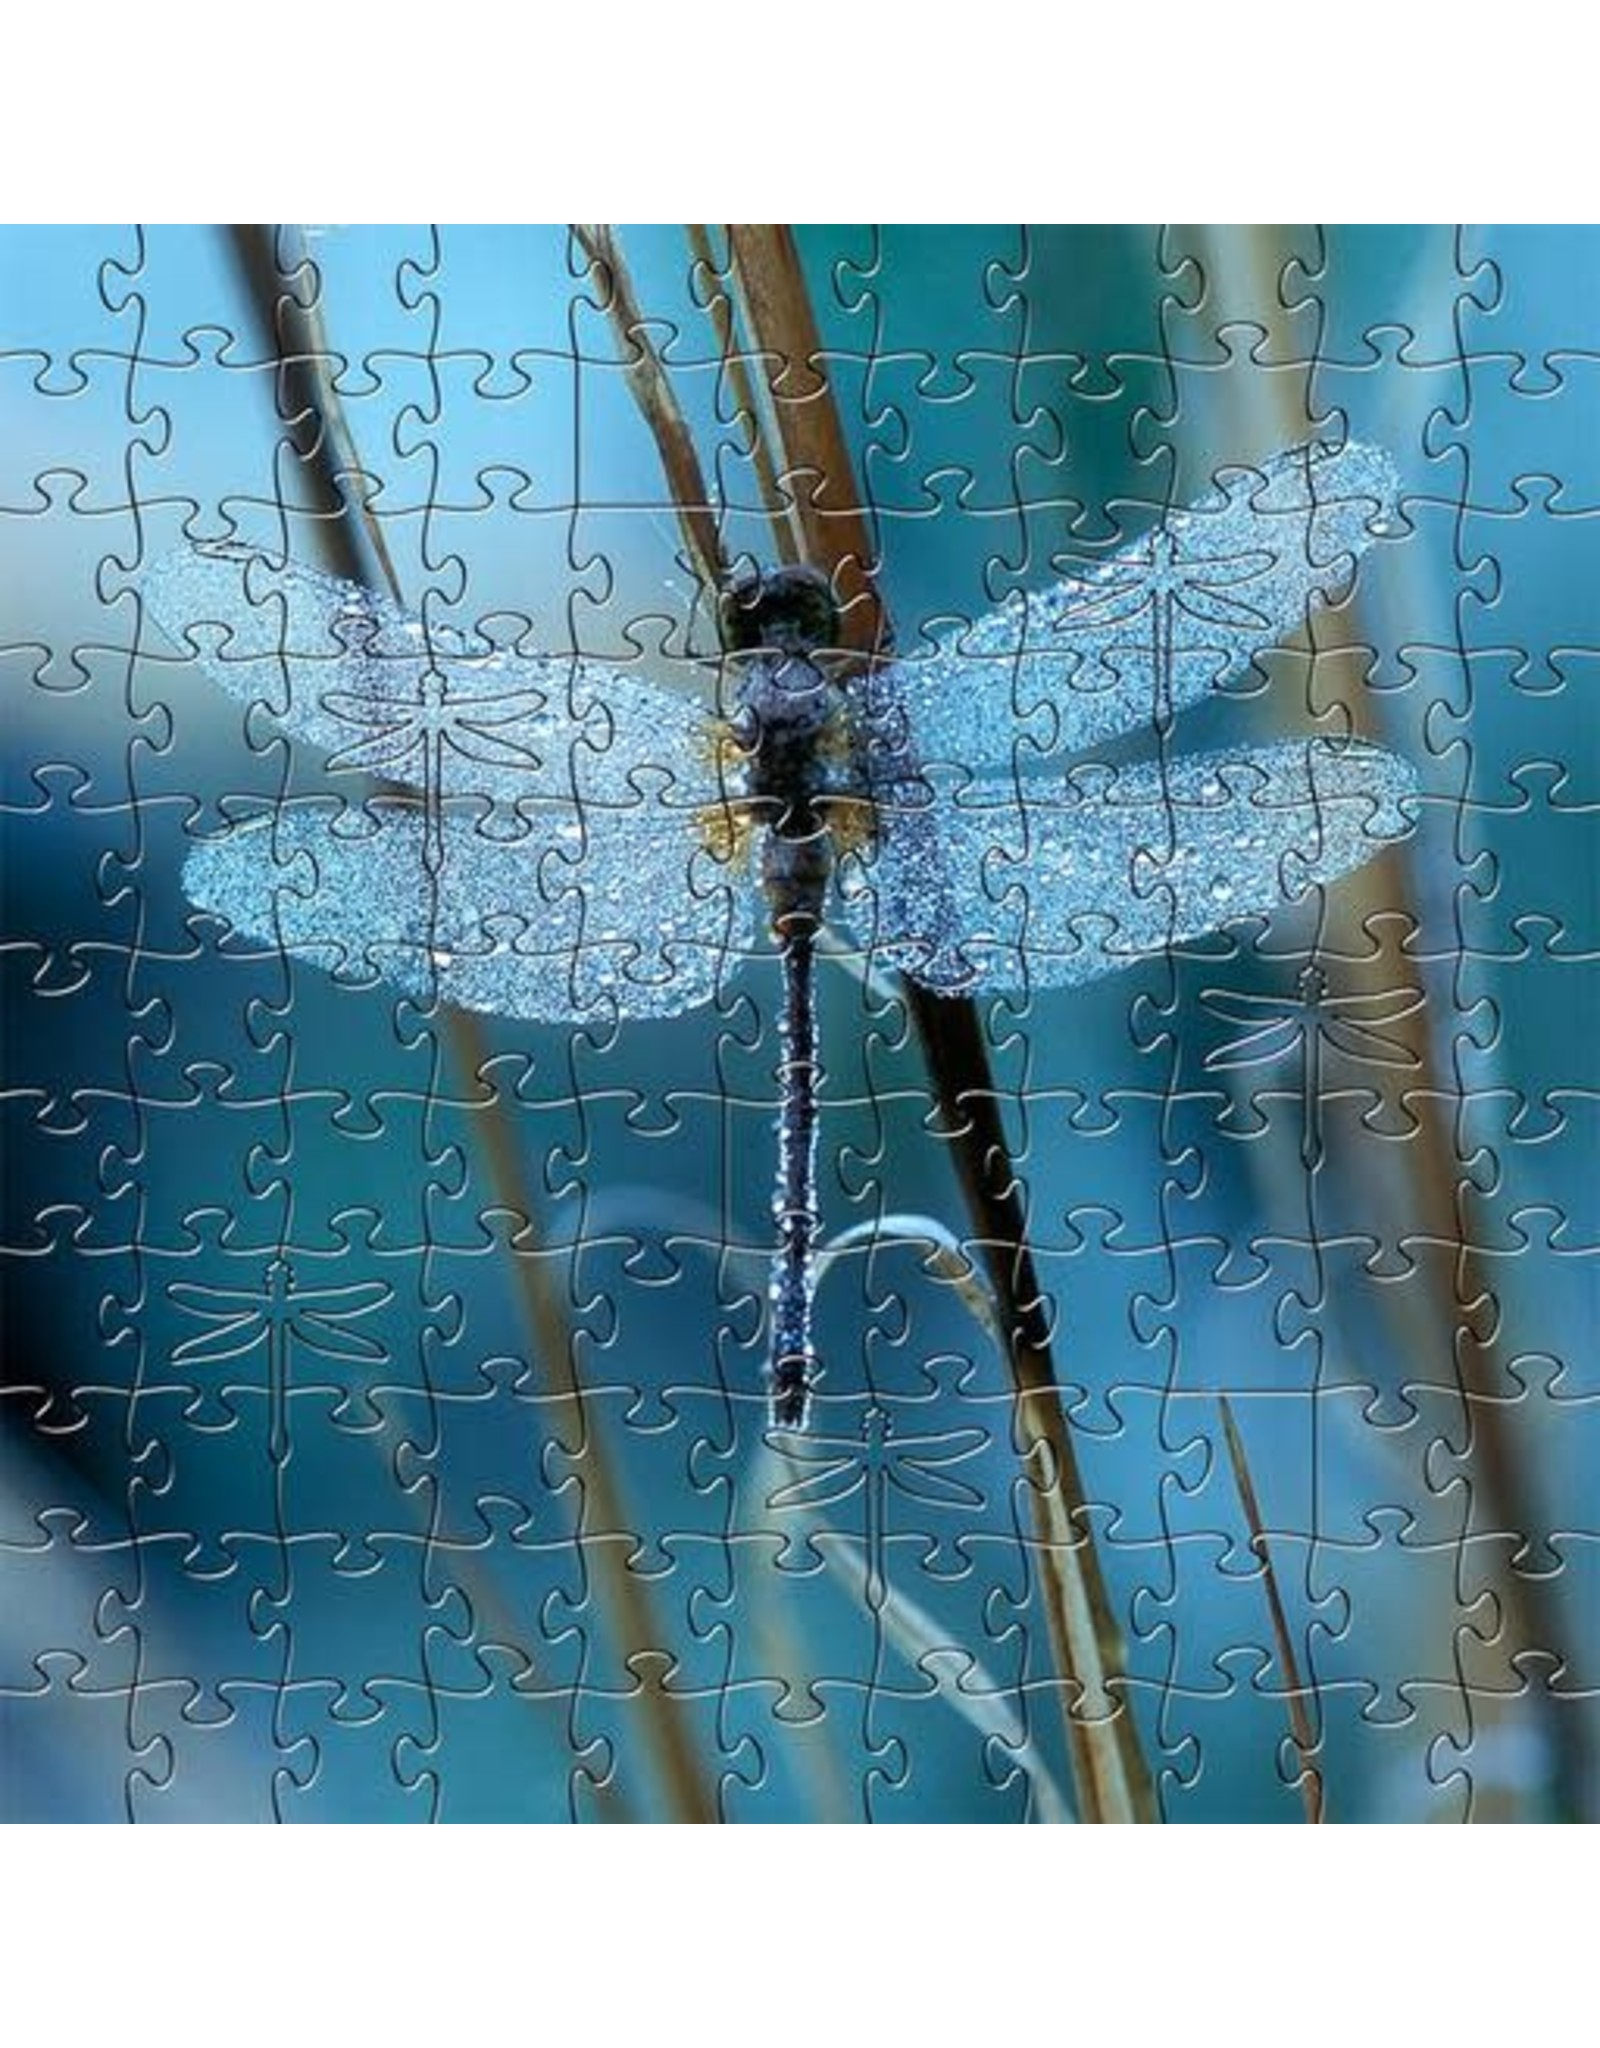 Zen Art & Design Waiting for the Sun (Sm, 126 Pieces, Artisanal Wooden Jigsaw Puzzle)